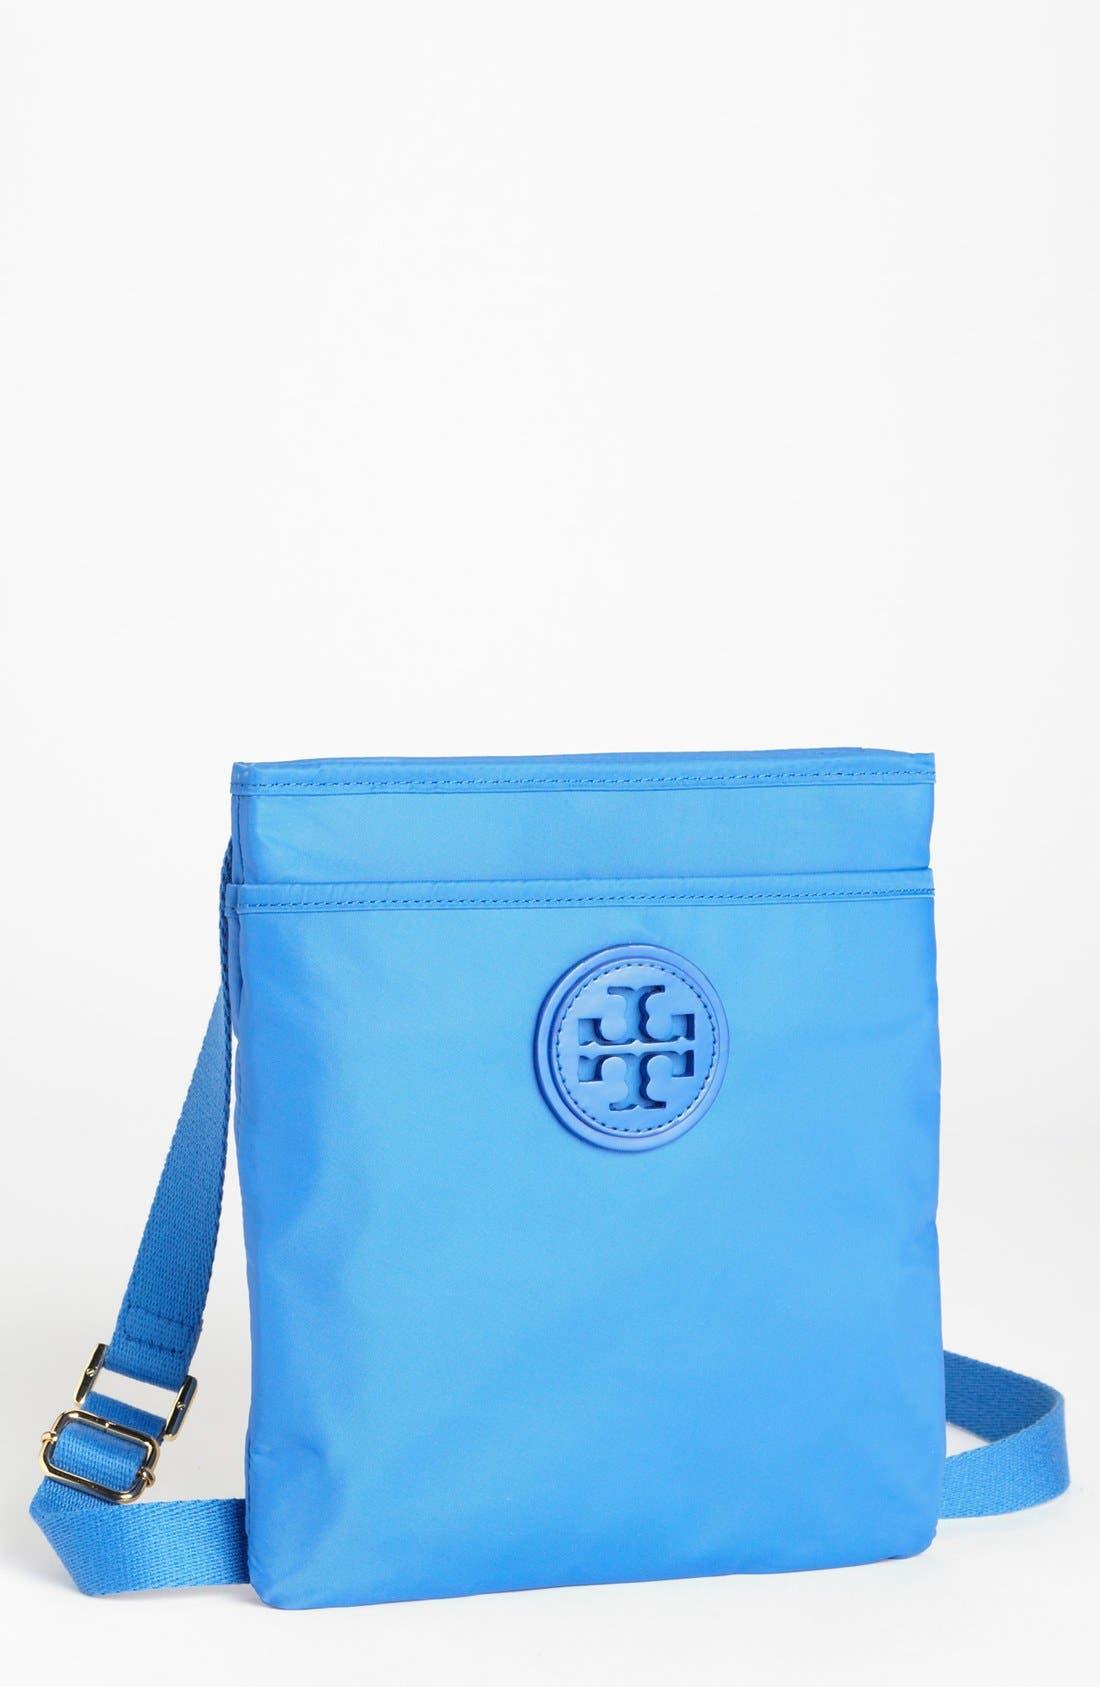 Alternate Image 1 Selected - Tory Burch Nylon Crossbody Bag